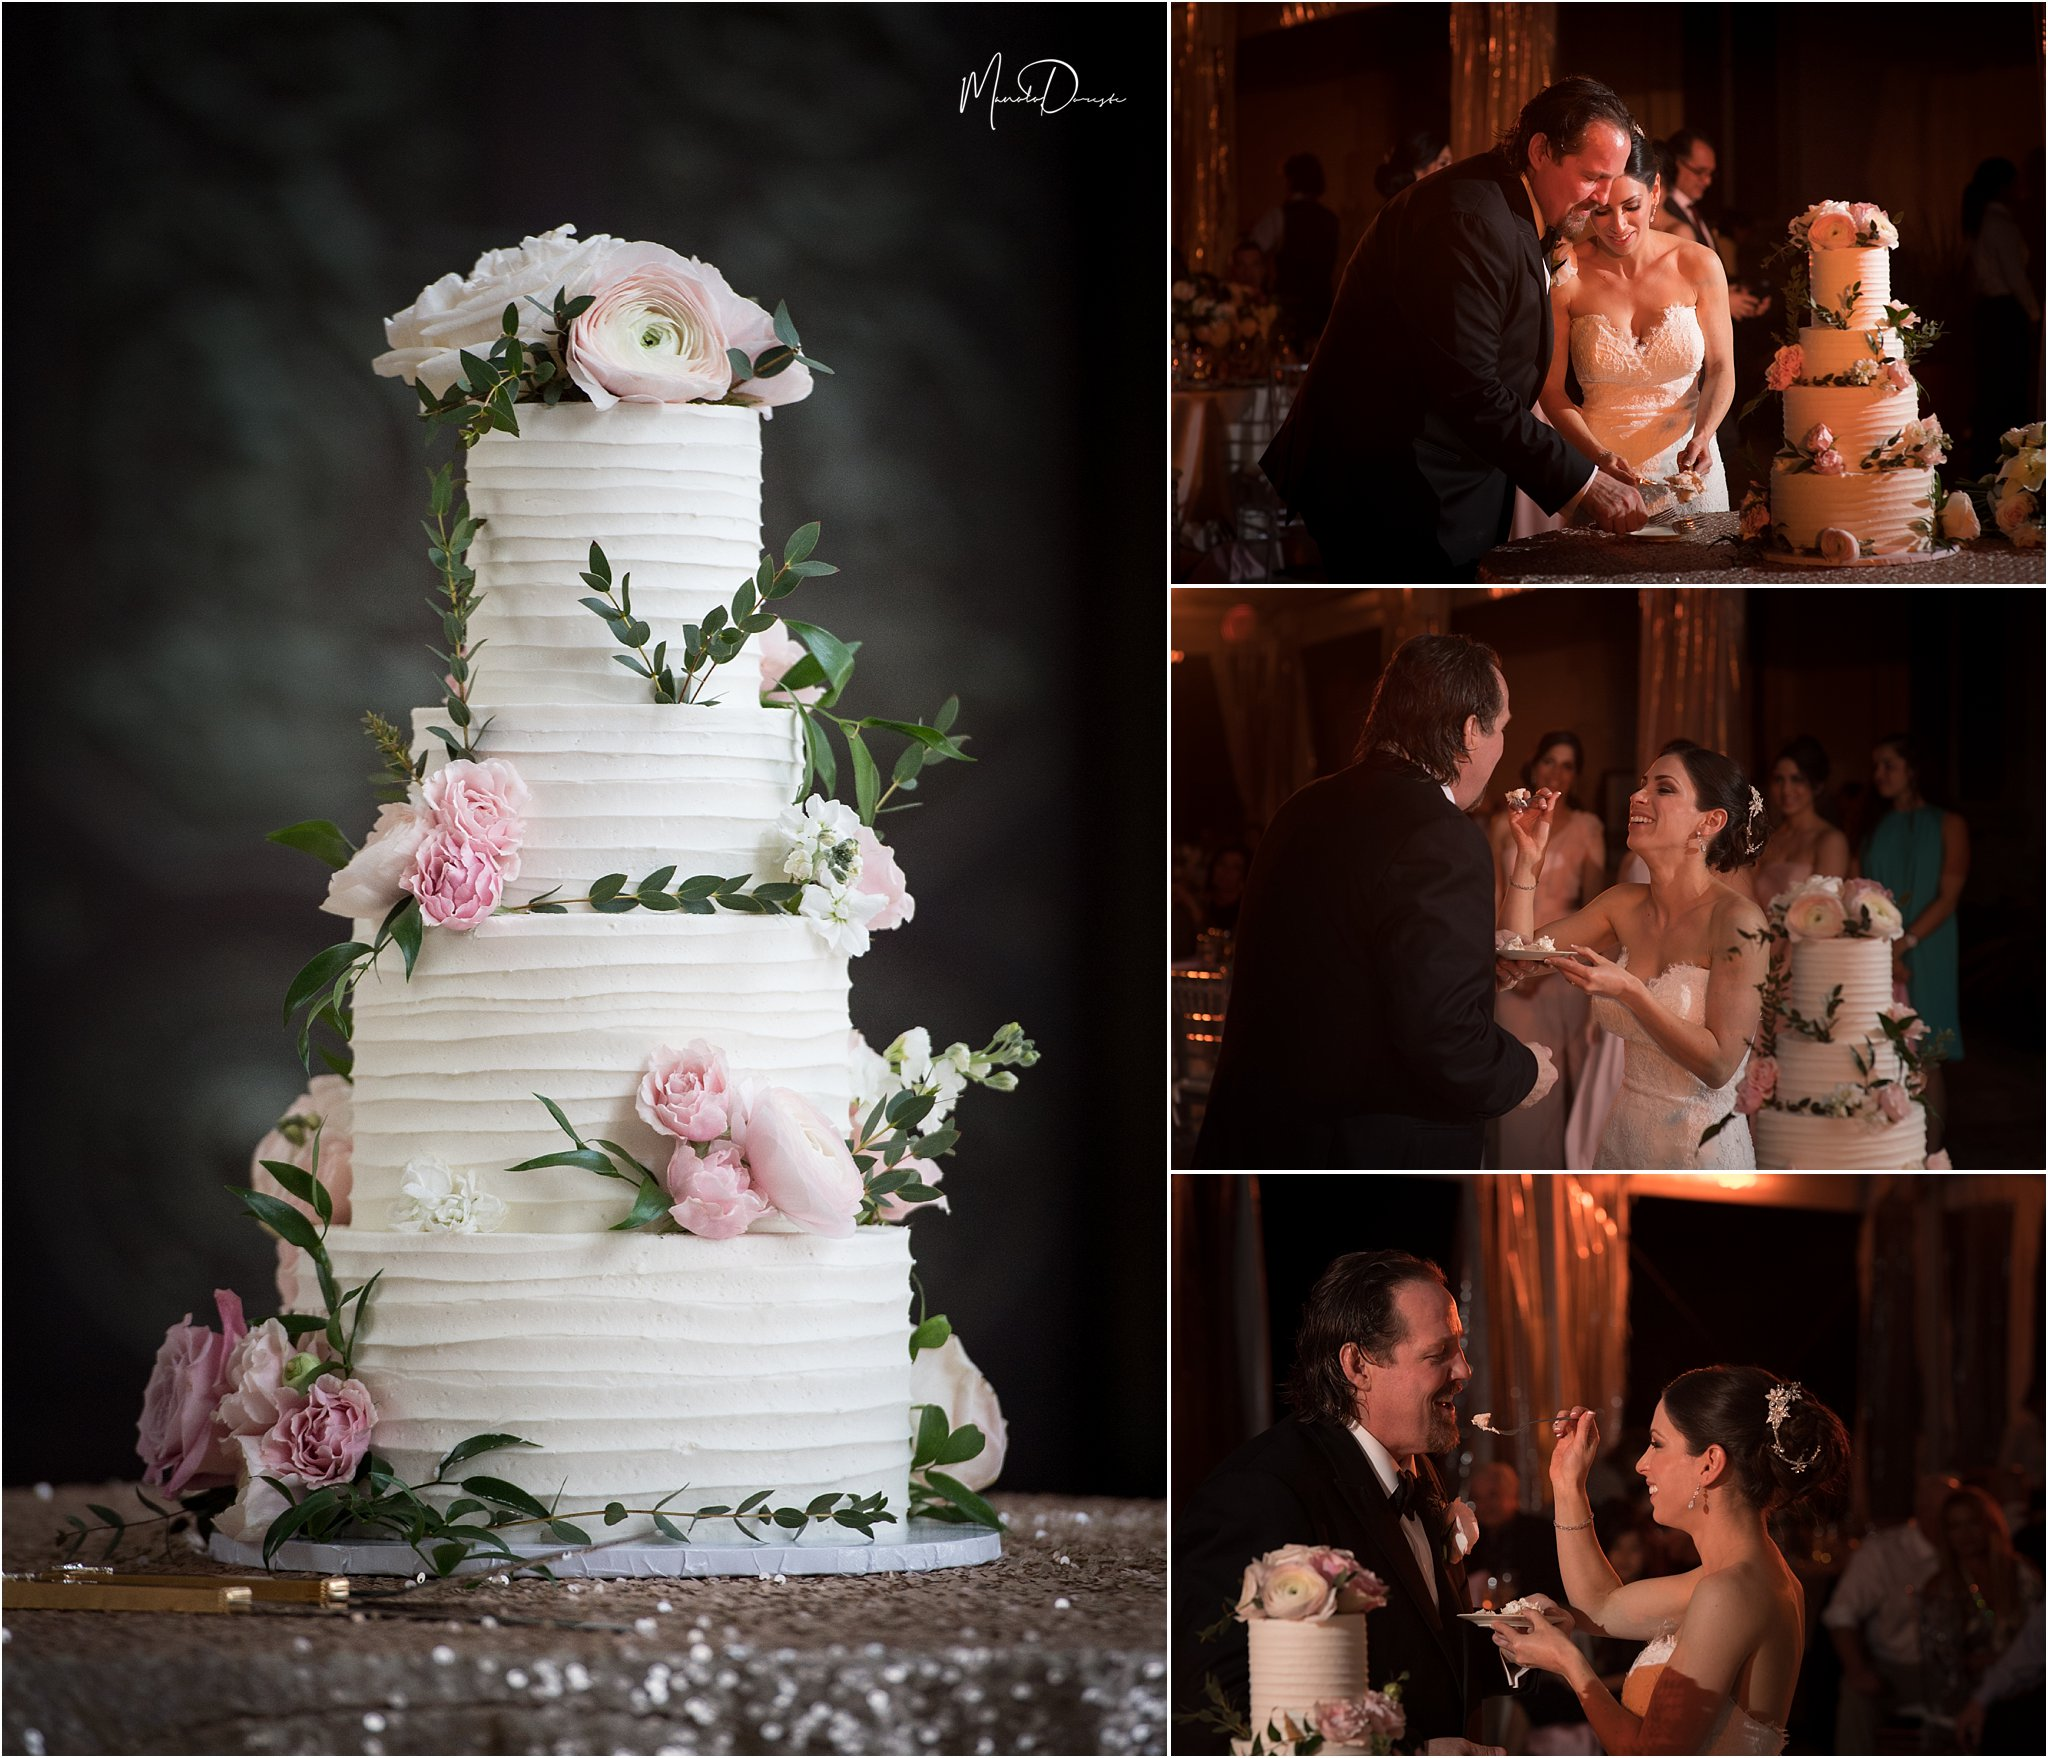 00763_ManoloDoreste_InFocusStudios_Wedding_Family_Photography_Miami_MiamiPhotographer.jpg